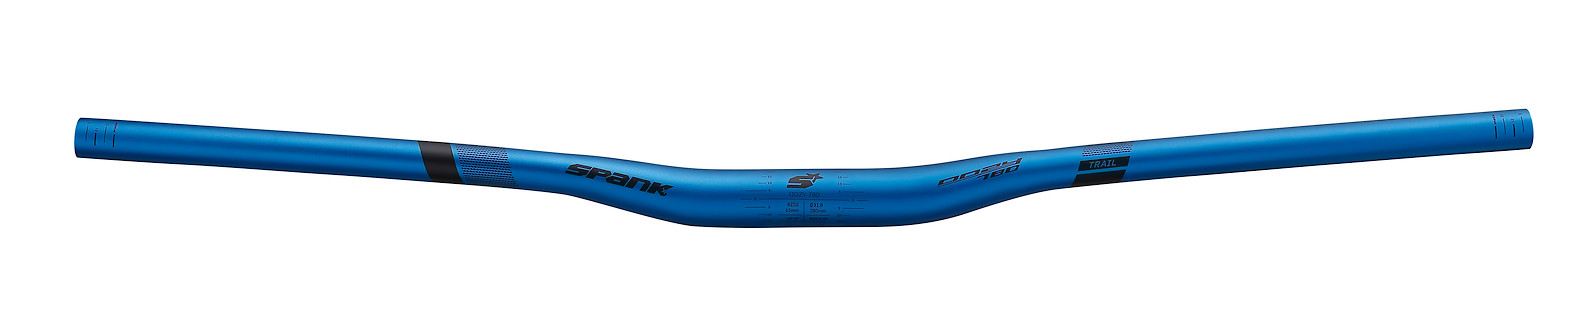 Spank Oozy Trail 780 Rise 15mm Cintre VTT Mixte